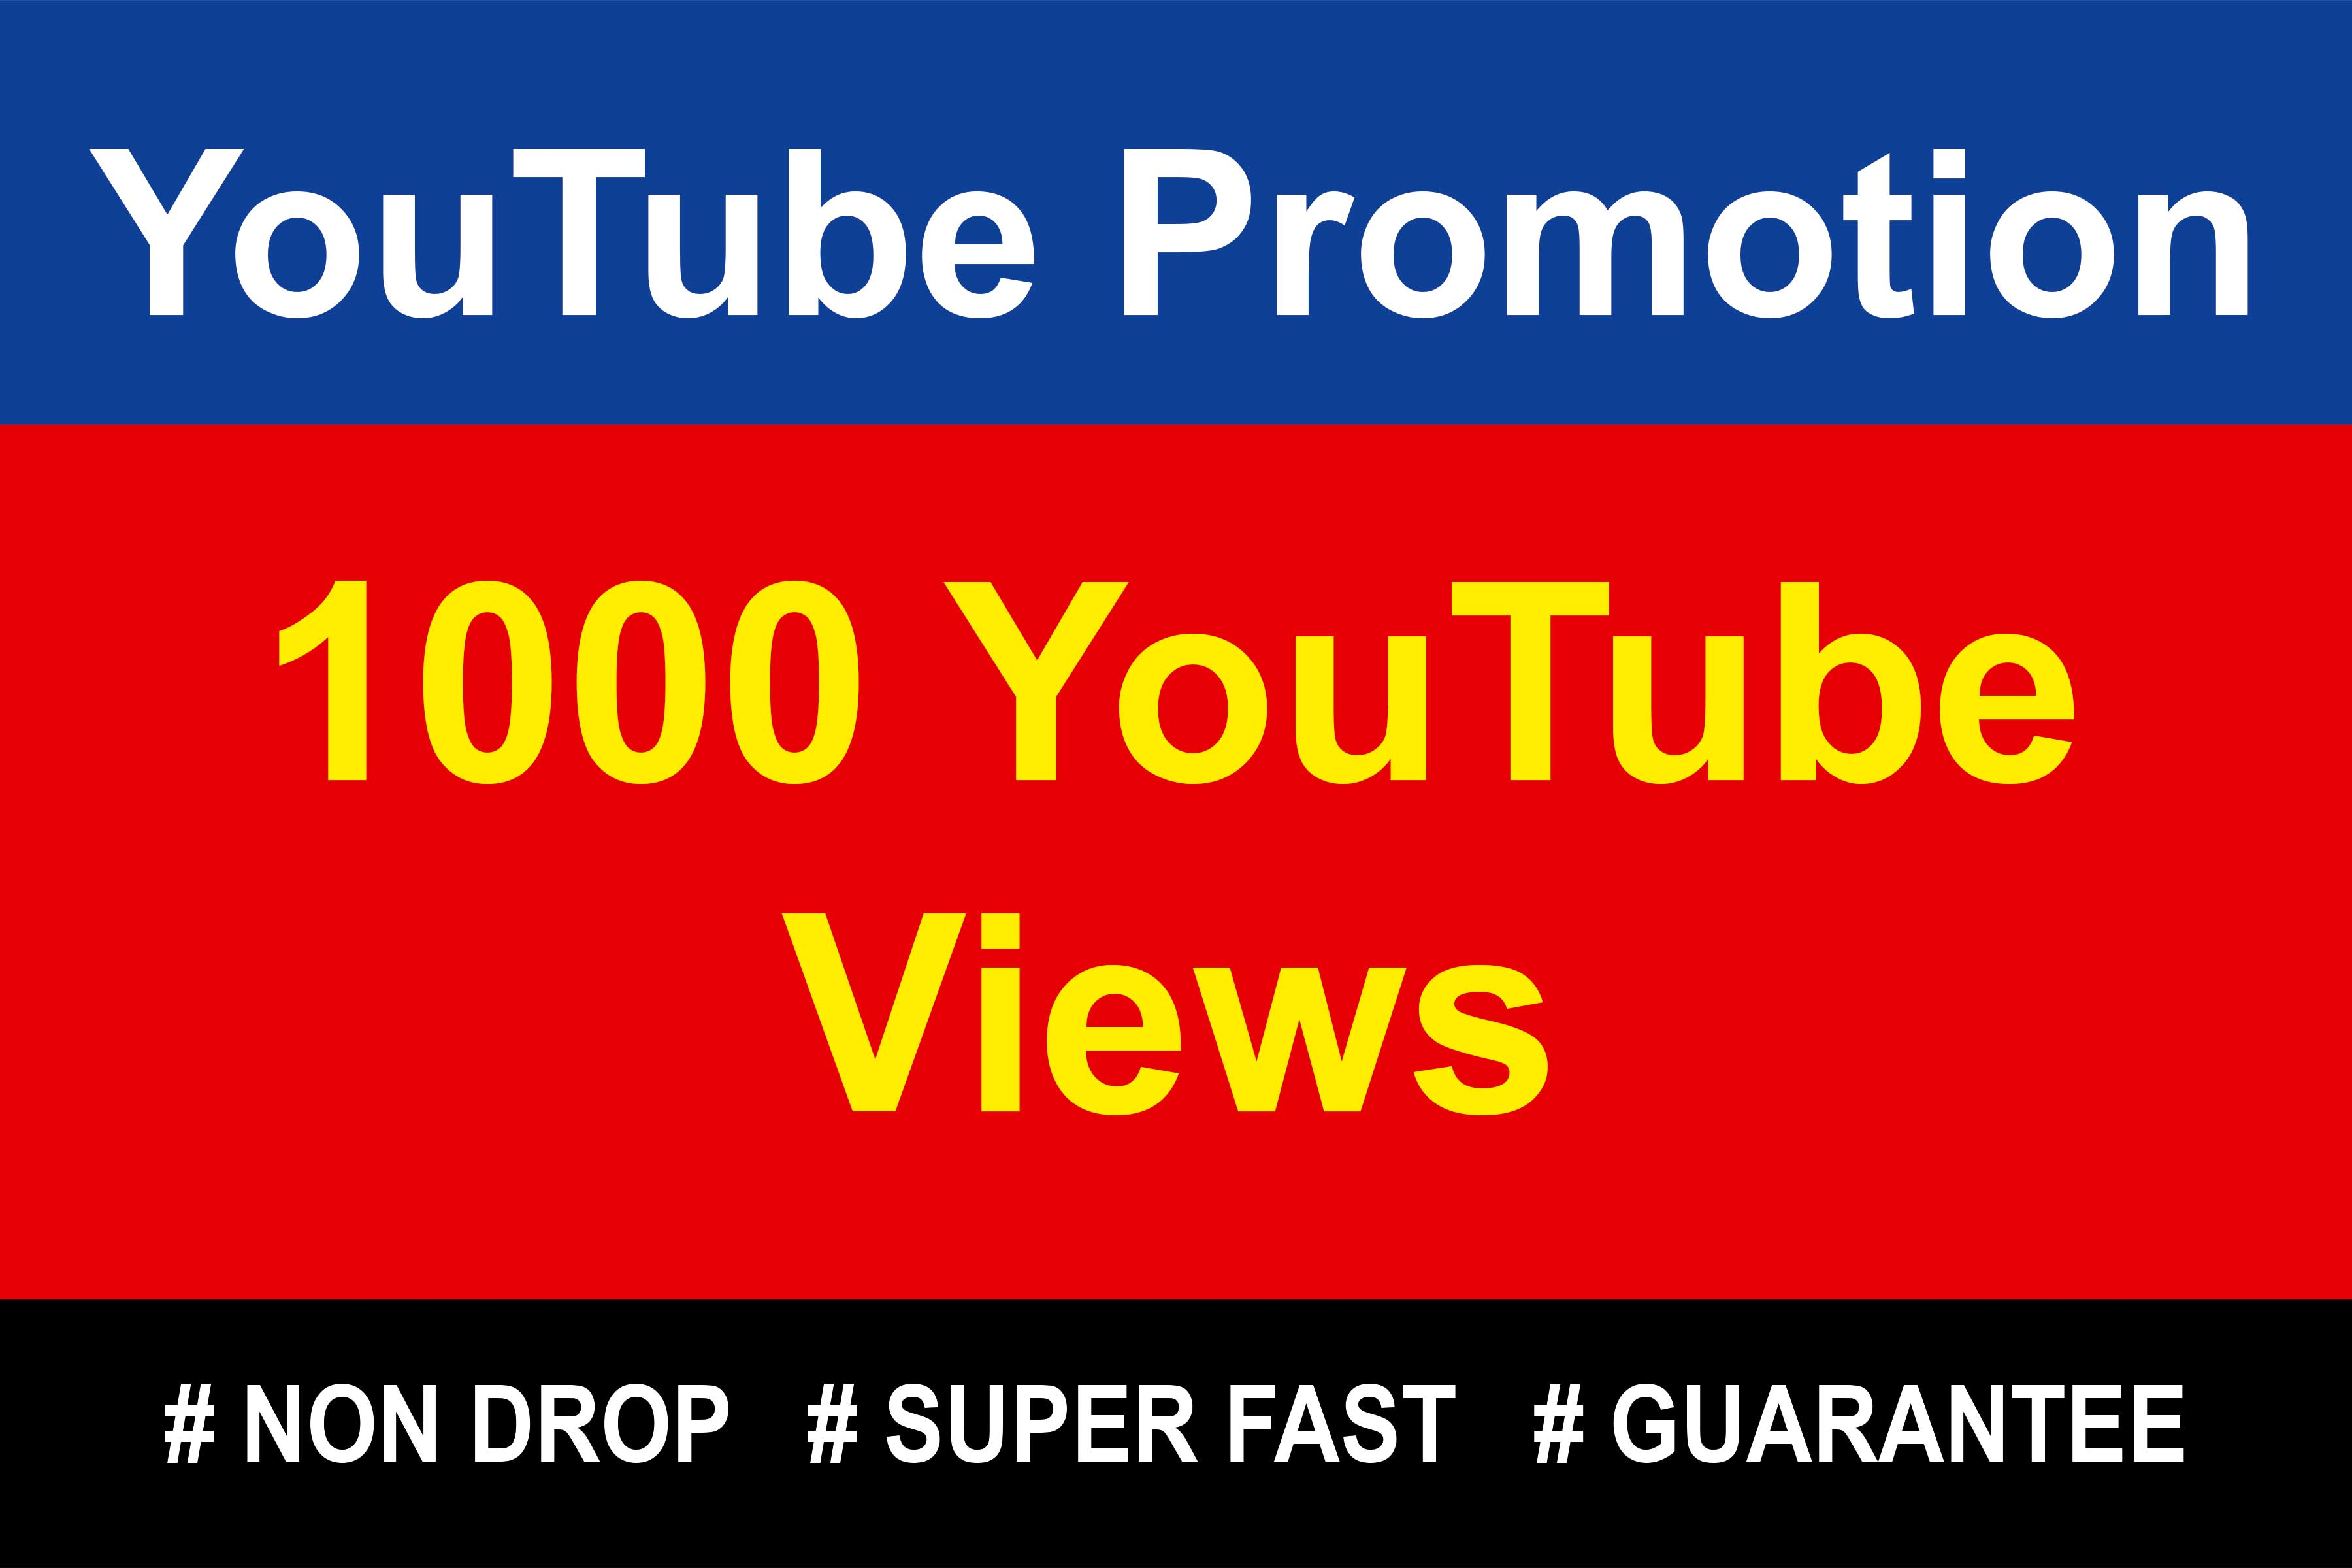 Guaranteed 1000 YouTube Video Marketing & Promotion